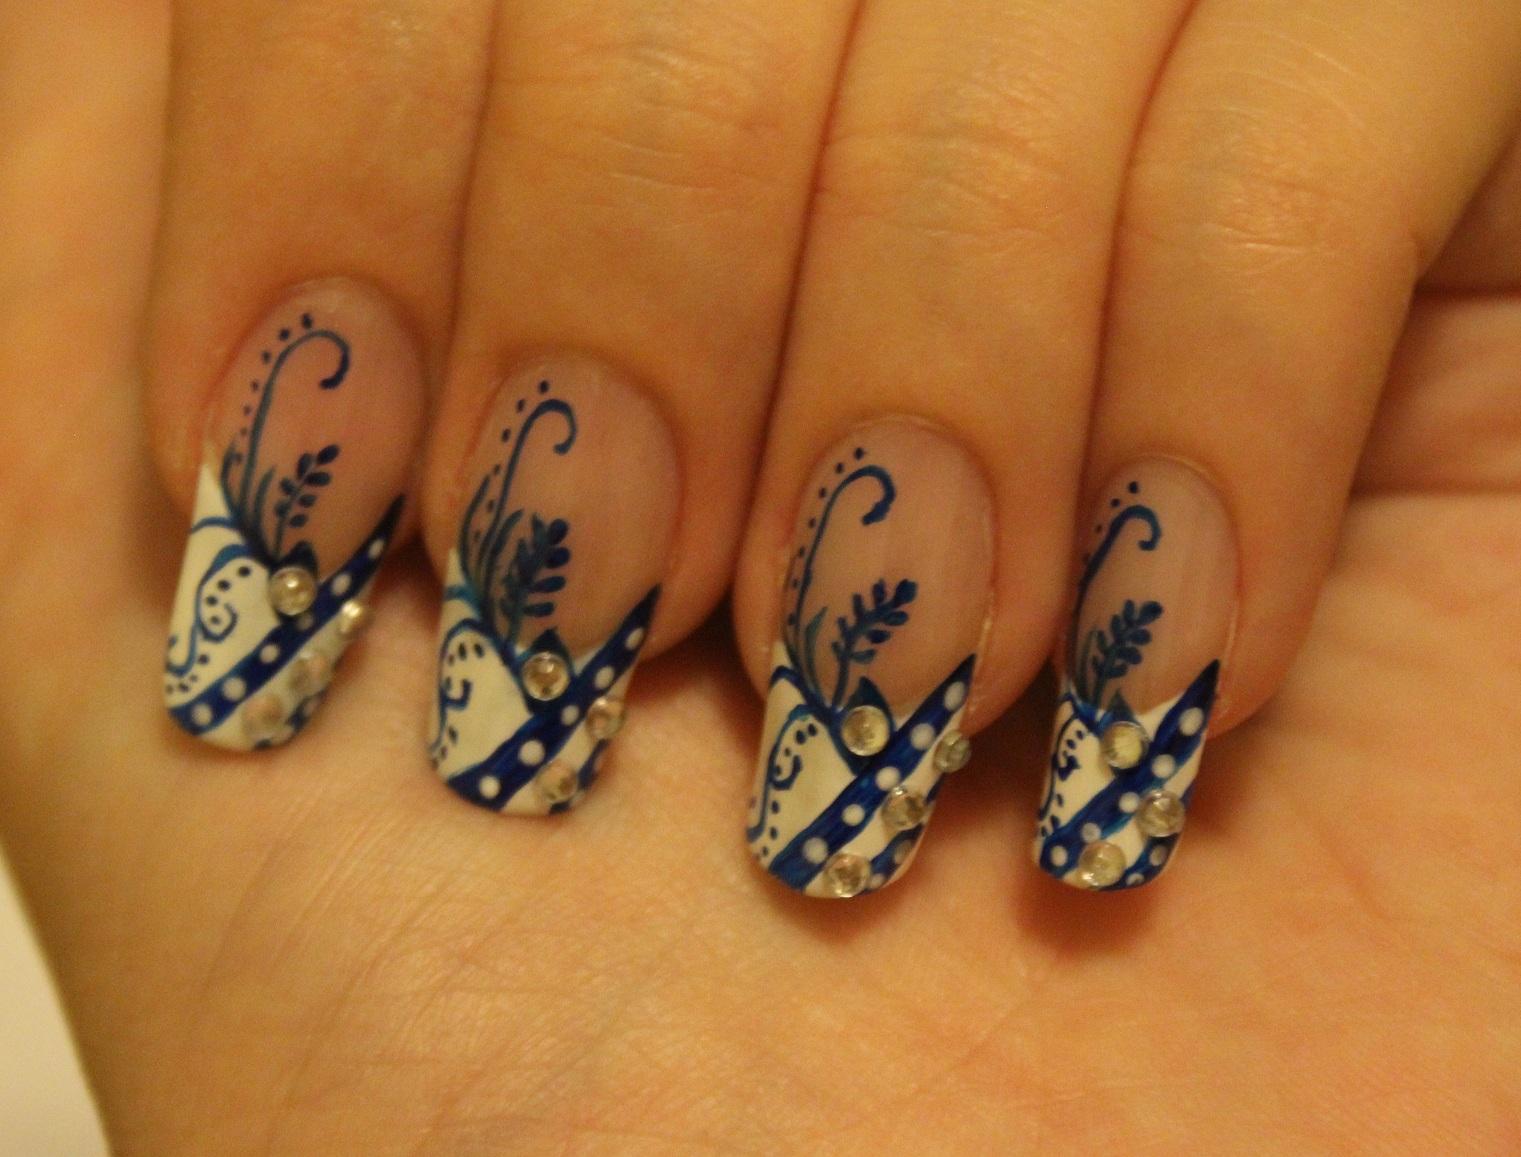 Nail Design Tutorials 2012: Nail Design - Feather Elegance ...